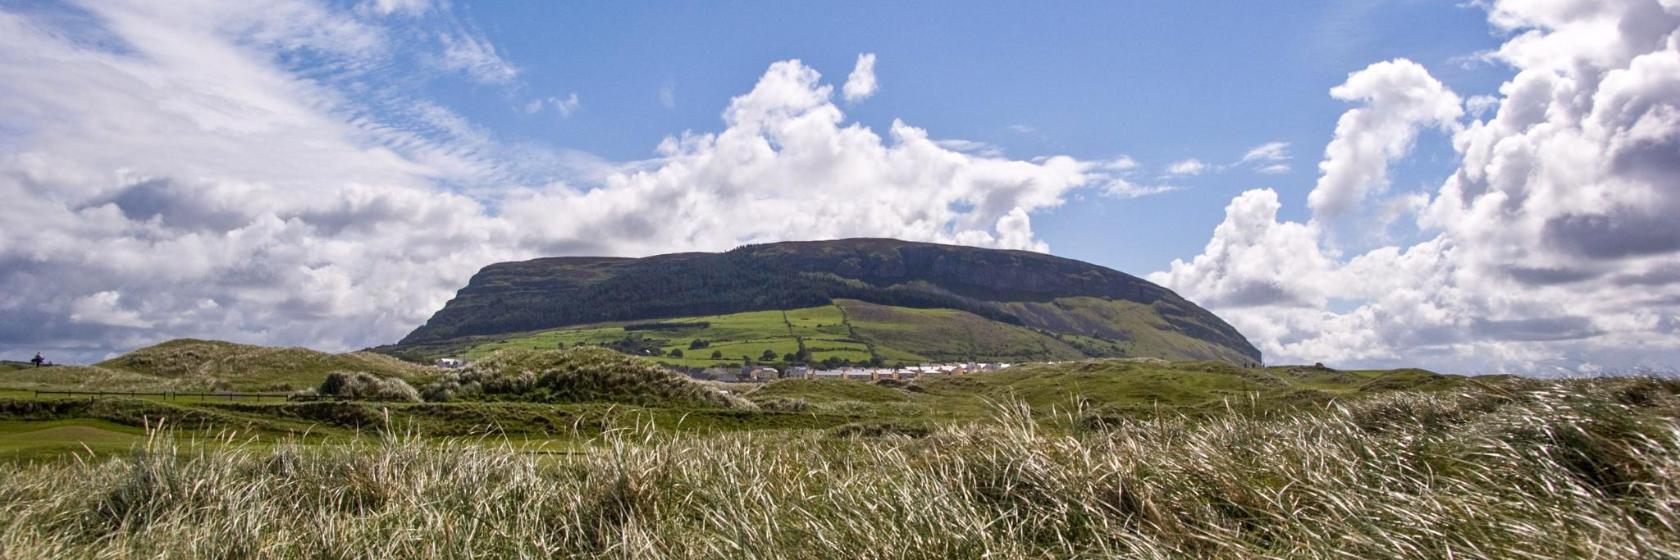 Airbnb | Lissadell - County Sligo, Ireland - Airbnb